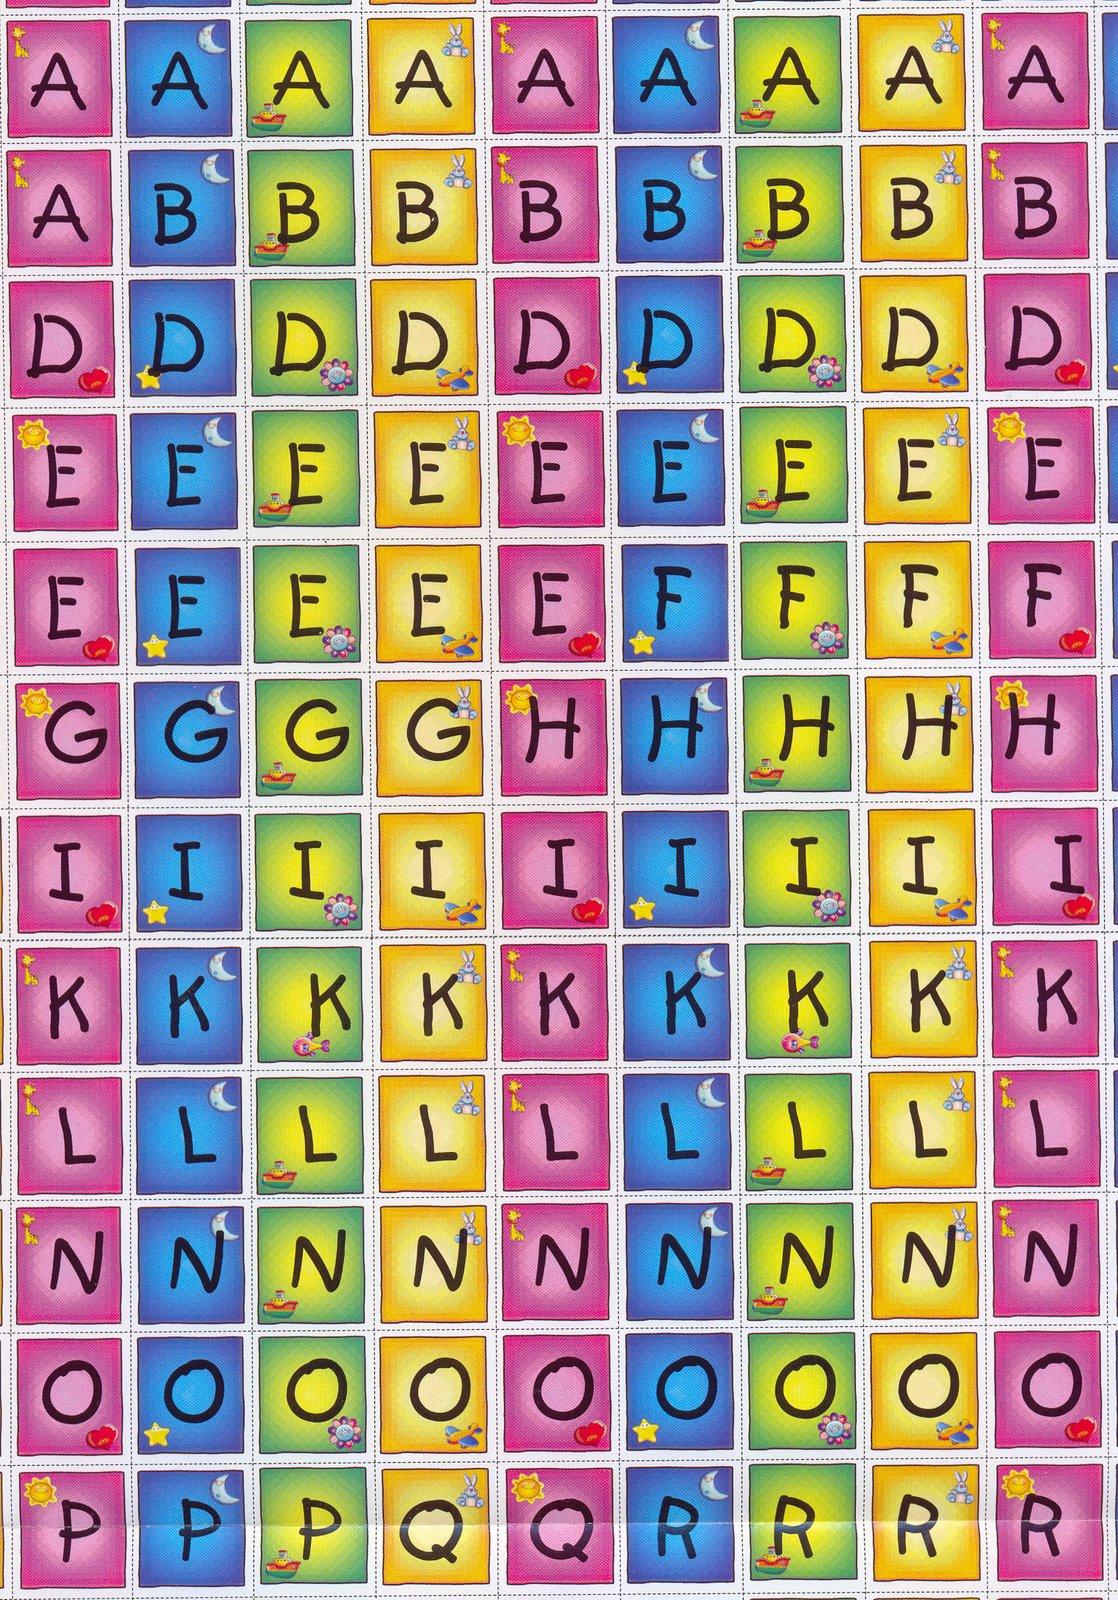 Alfabeto o Abecedario Móvil | Material para maestros